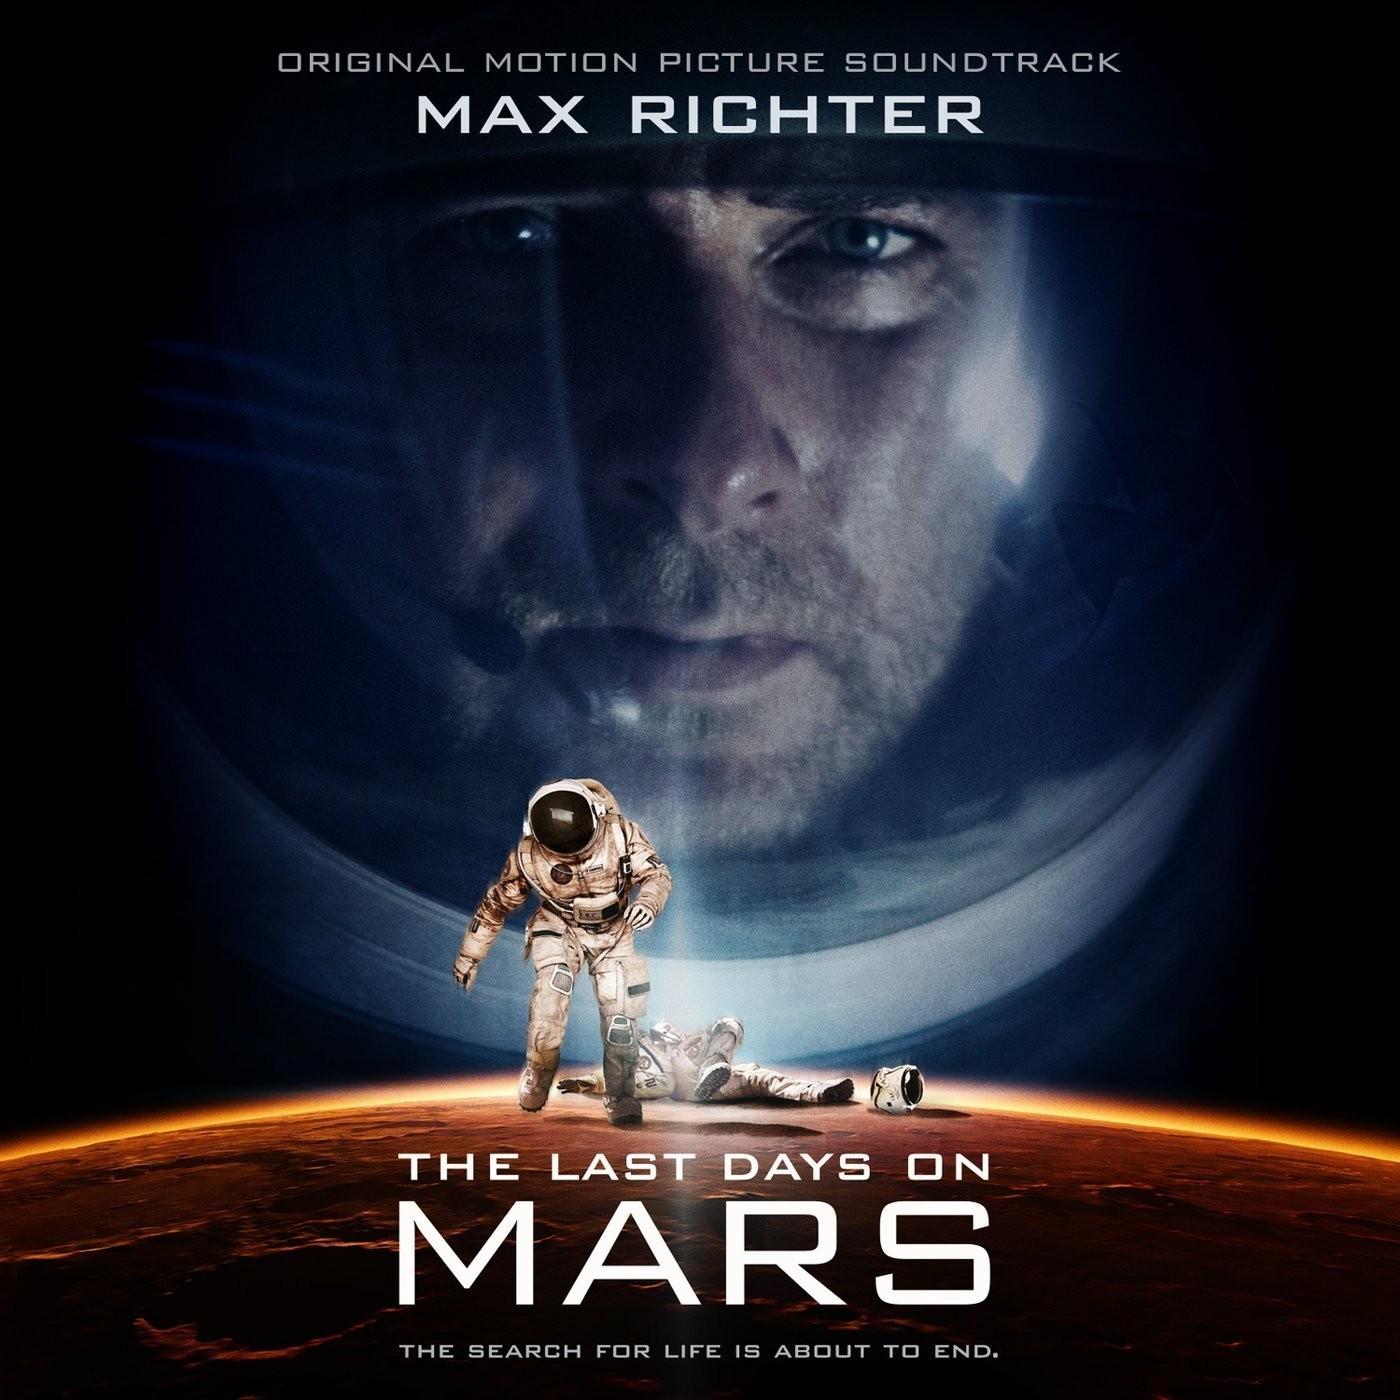 mission to mars movie soundtrack - photo #21